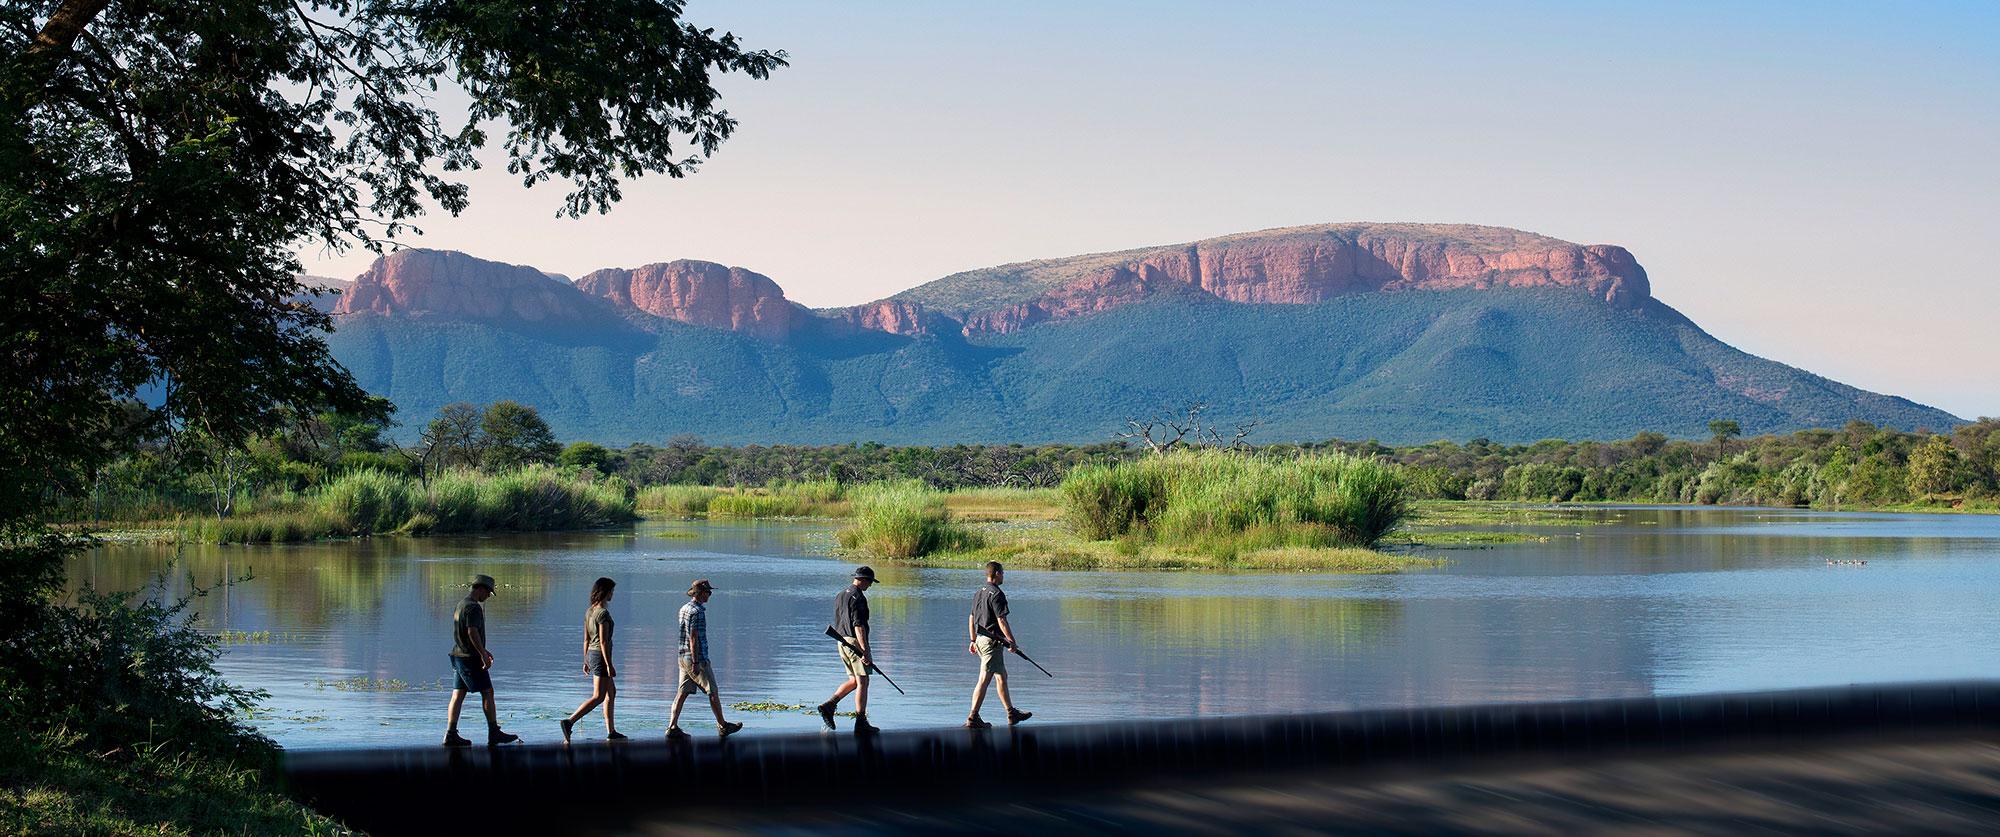 South Africa Kruger Safari - Marataba Trails Safari